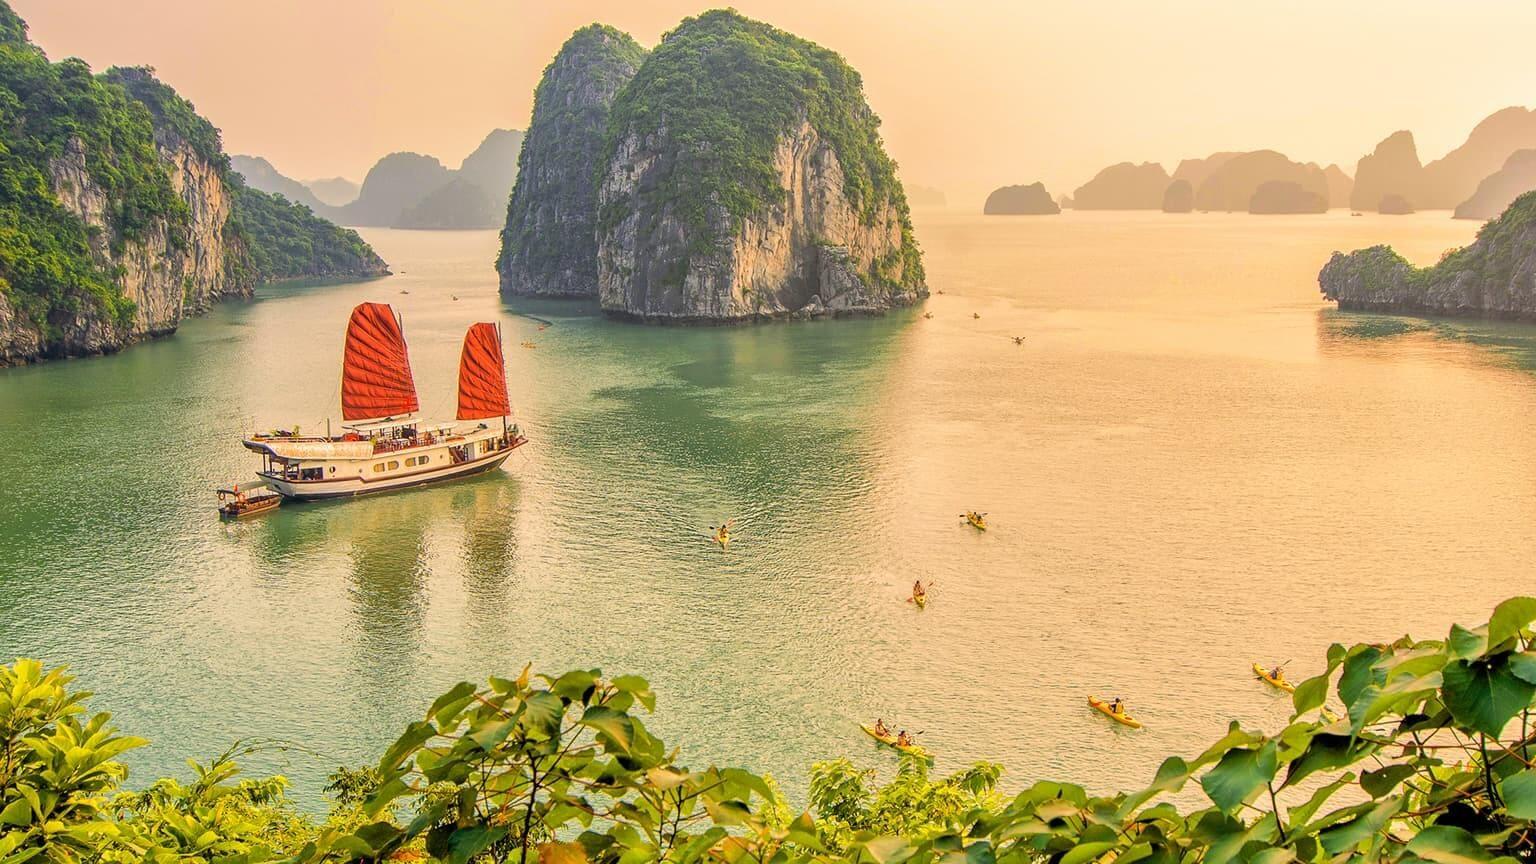 Sunset in Ha Long bay, Quang Ninh, Vietnam